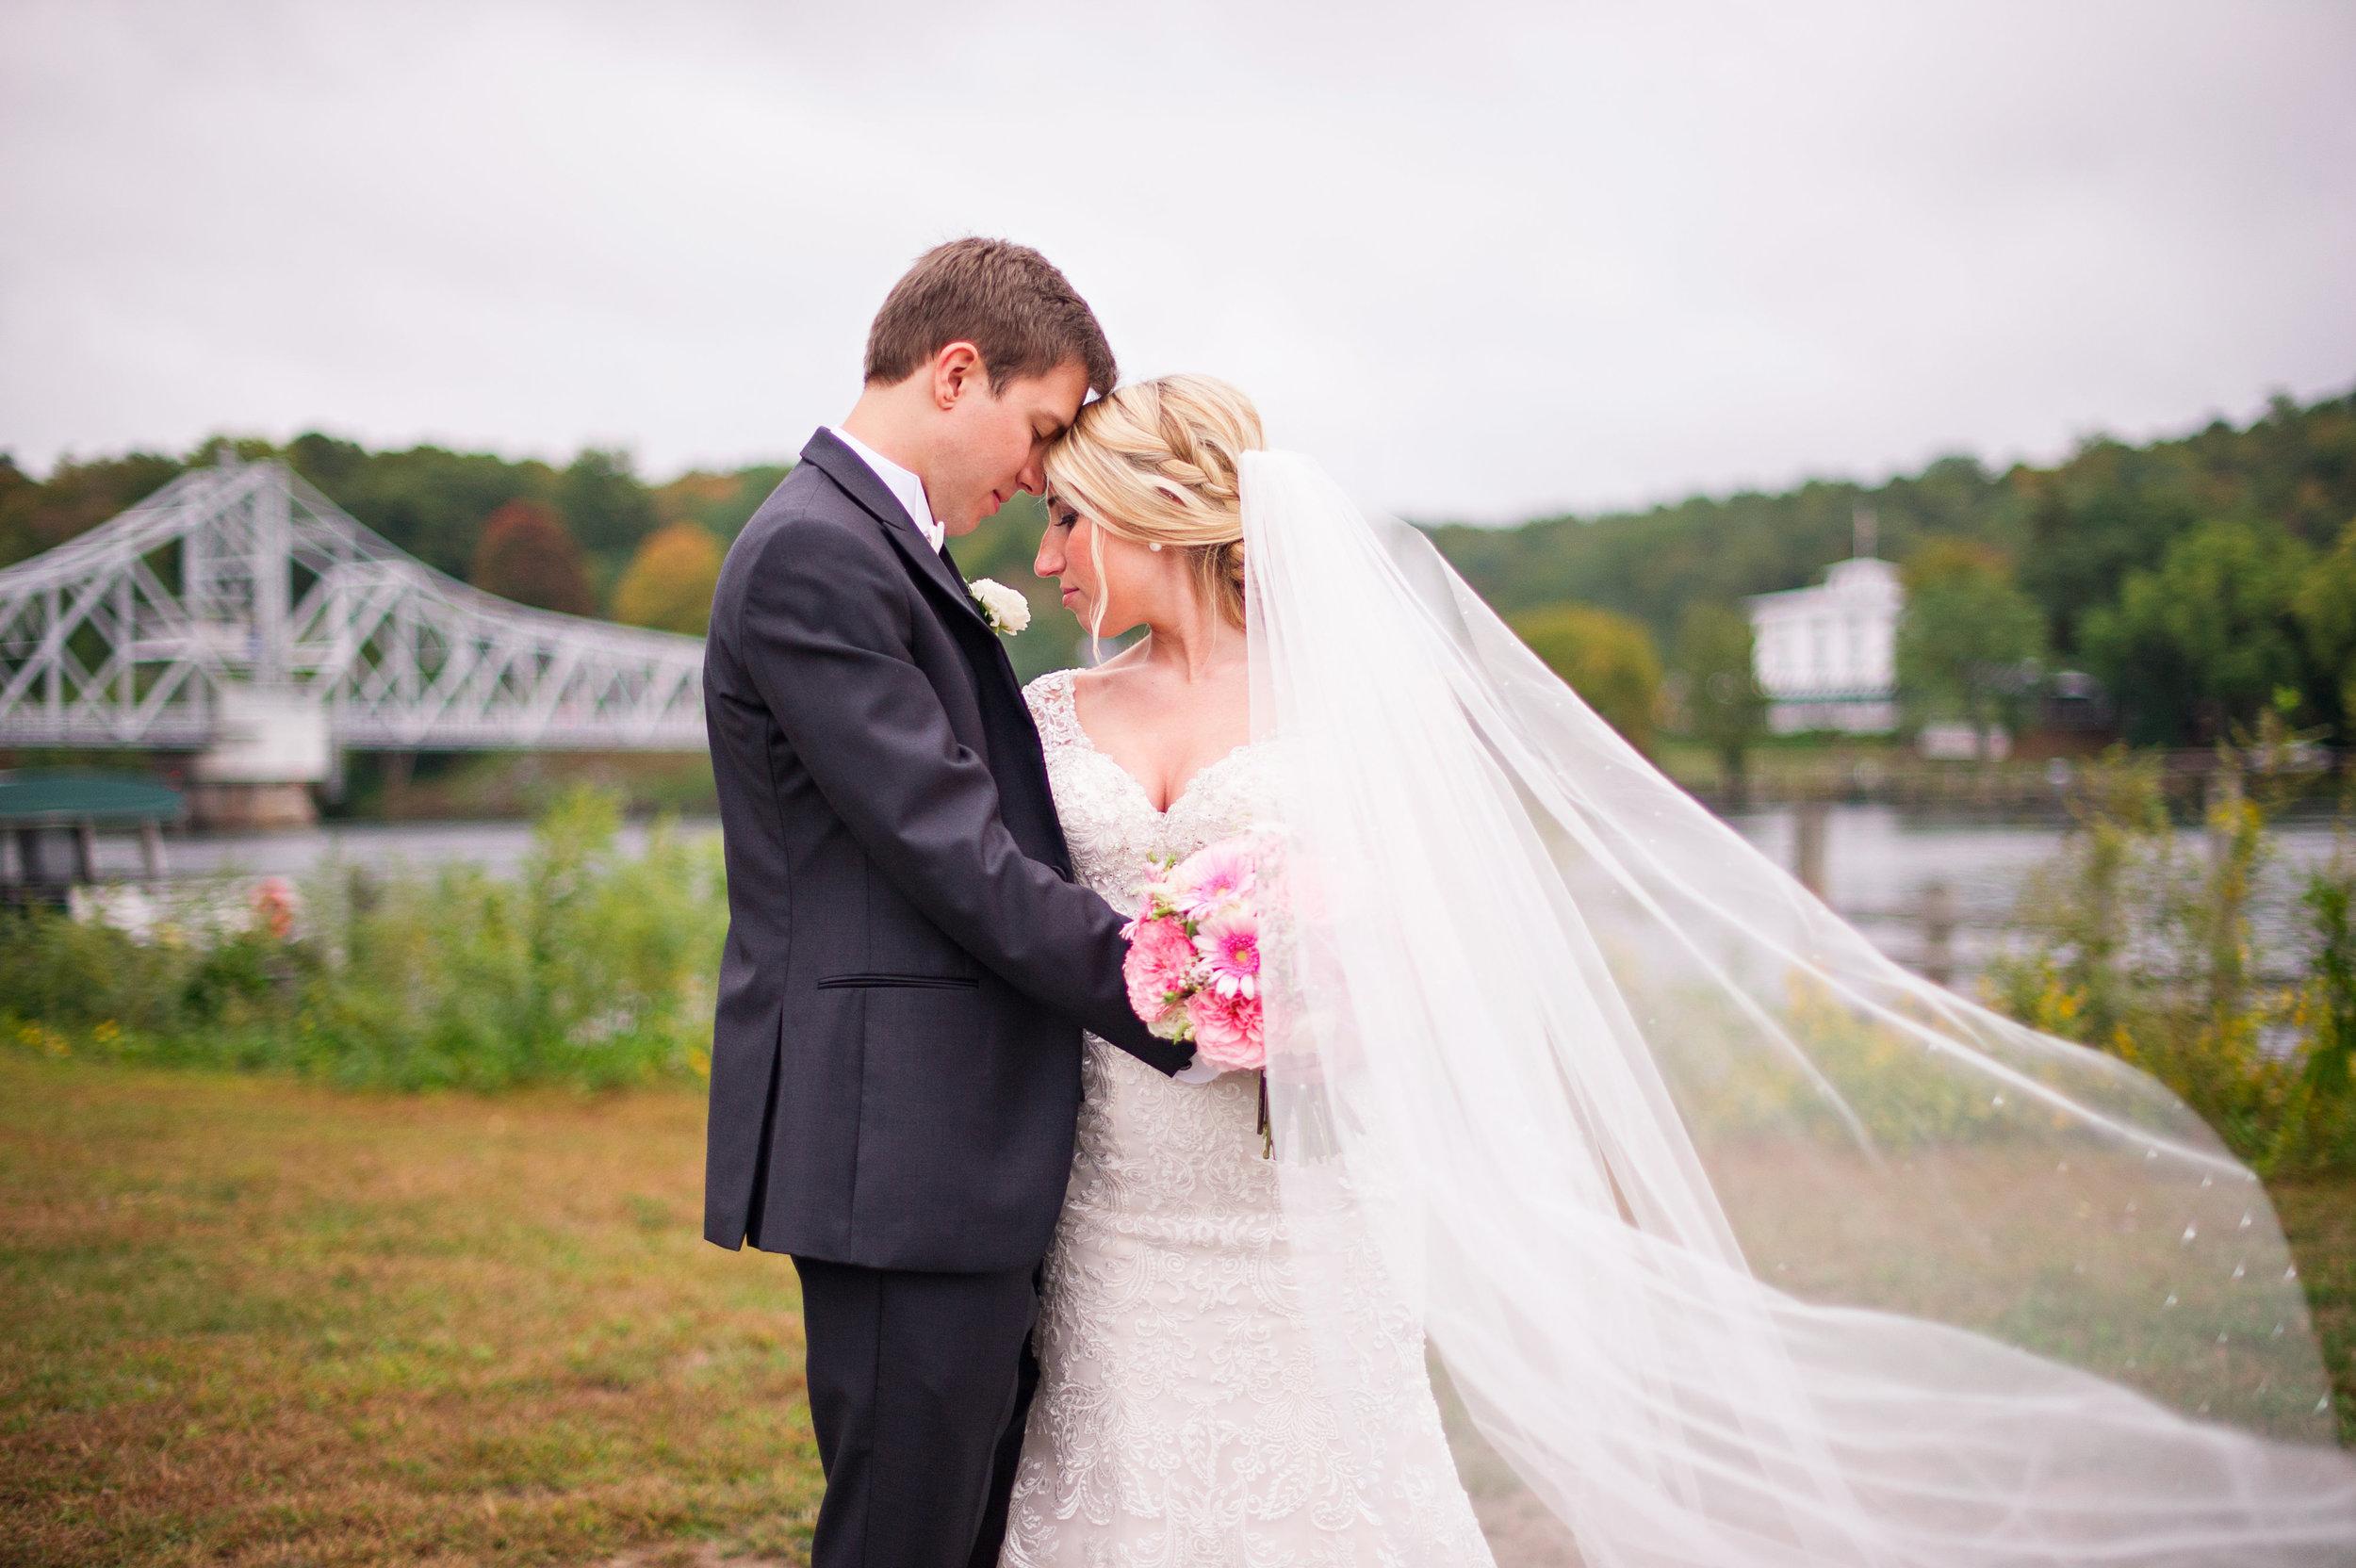 Goodspeed Riverhouse Wedding Ashley Therese Photography-64.jpg